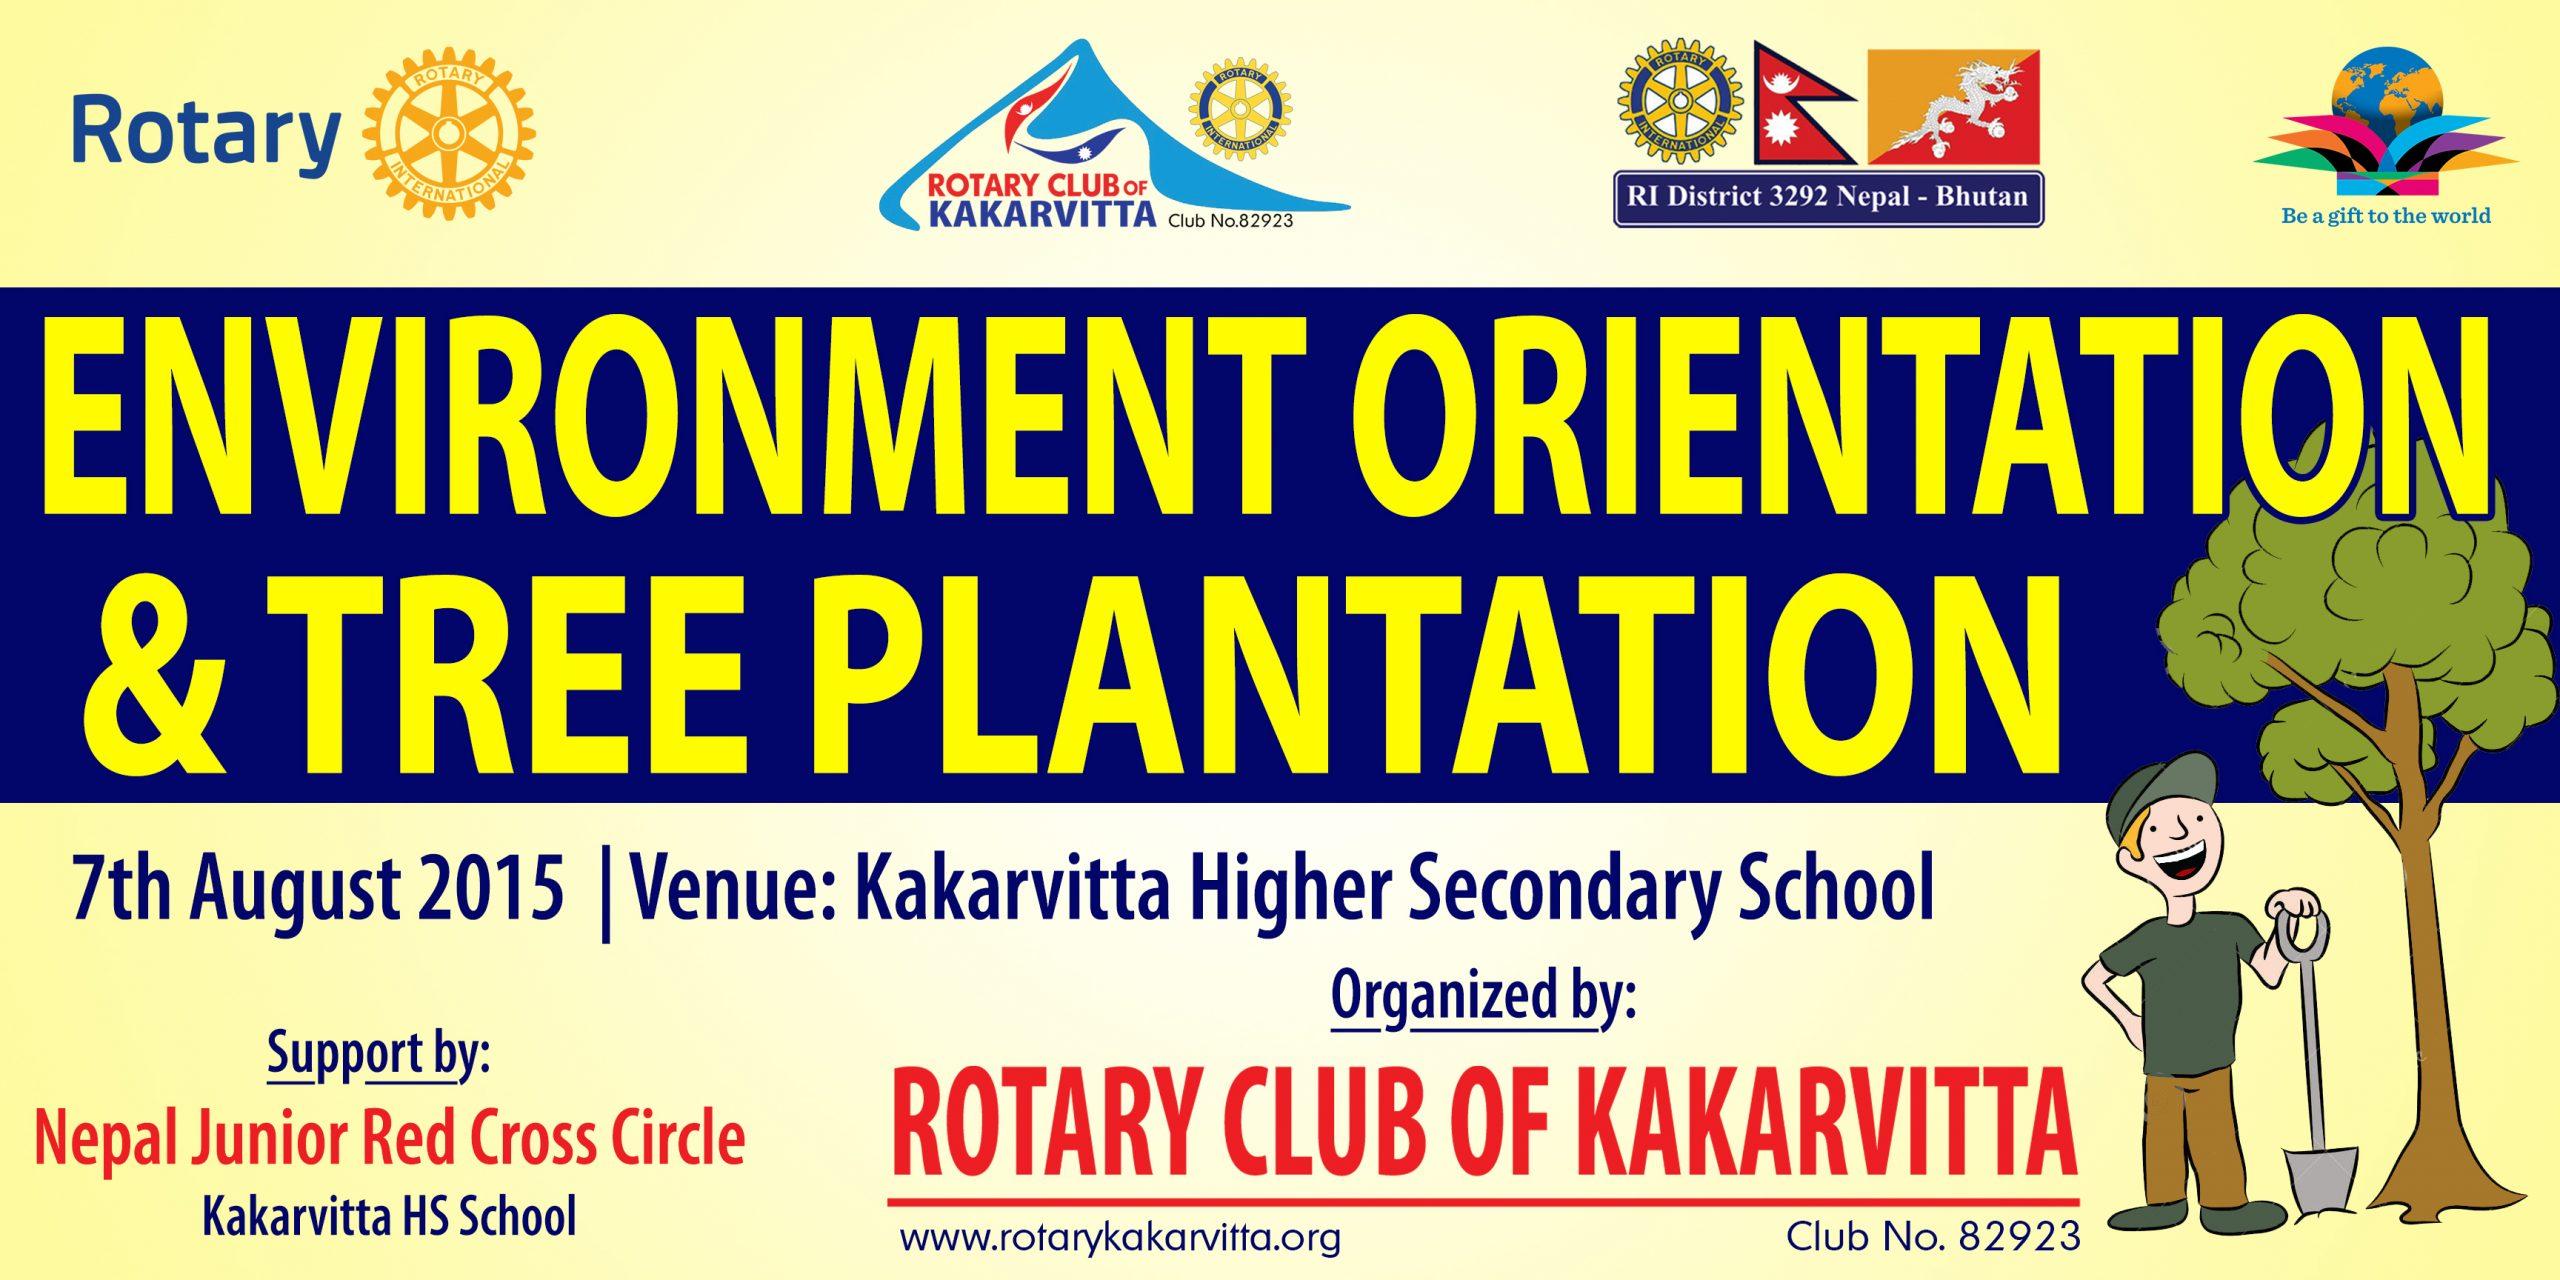 Enviroment Orientation Tree Plantation Rotary Club Of Kakarvitta 0 1